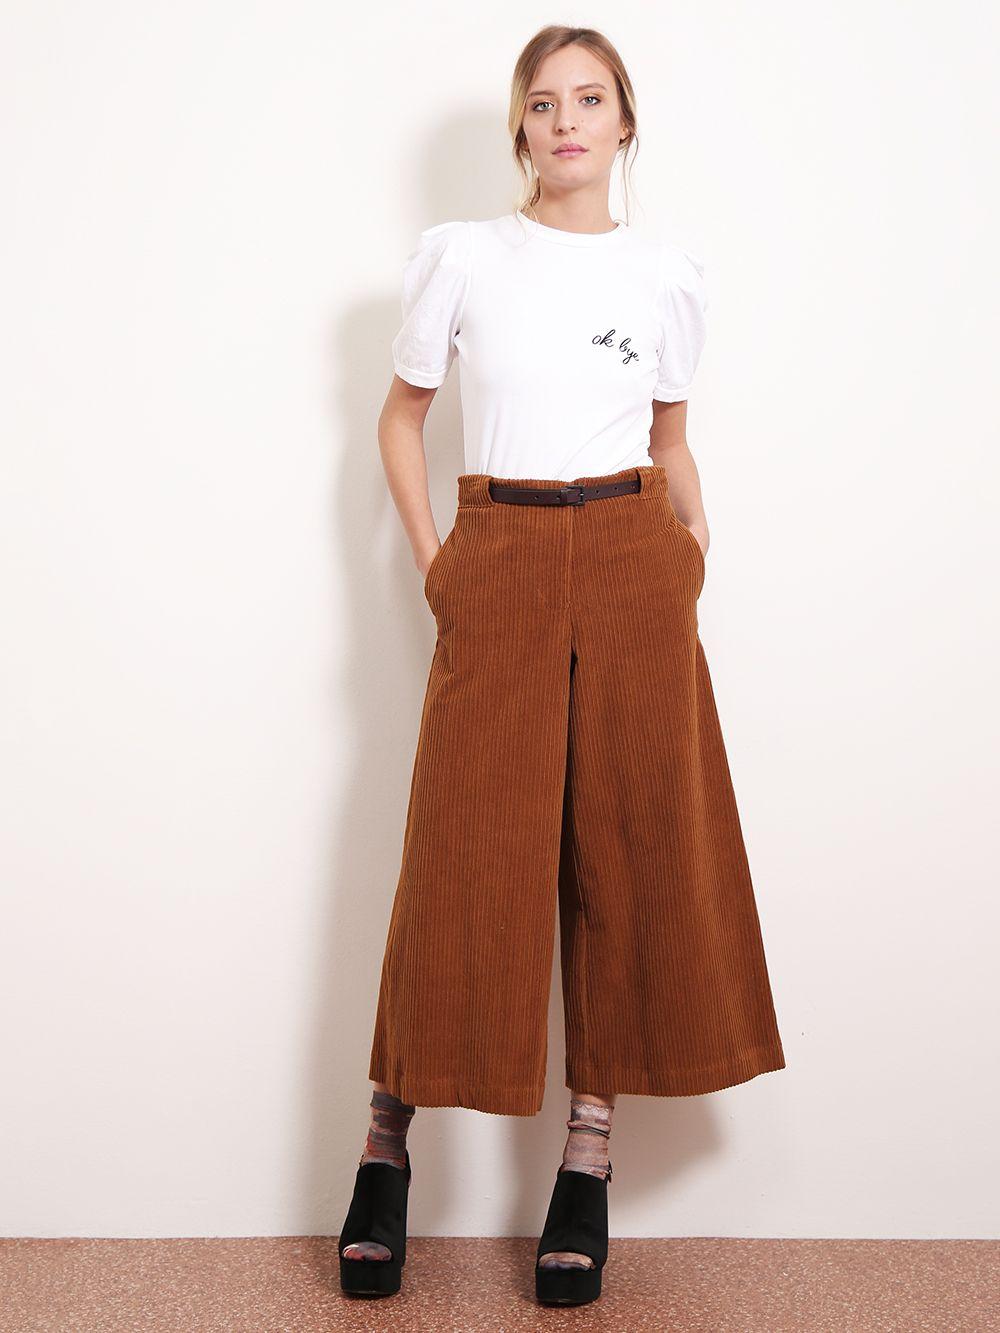 design innovativo 27edd 3142a GONNA PANTALONE IN VELLUTO A COSTE   Abiti   Velvet skirt ...